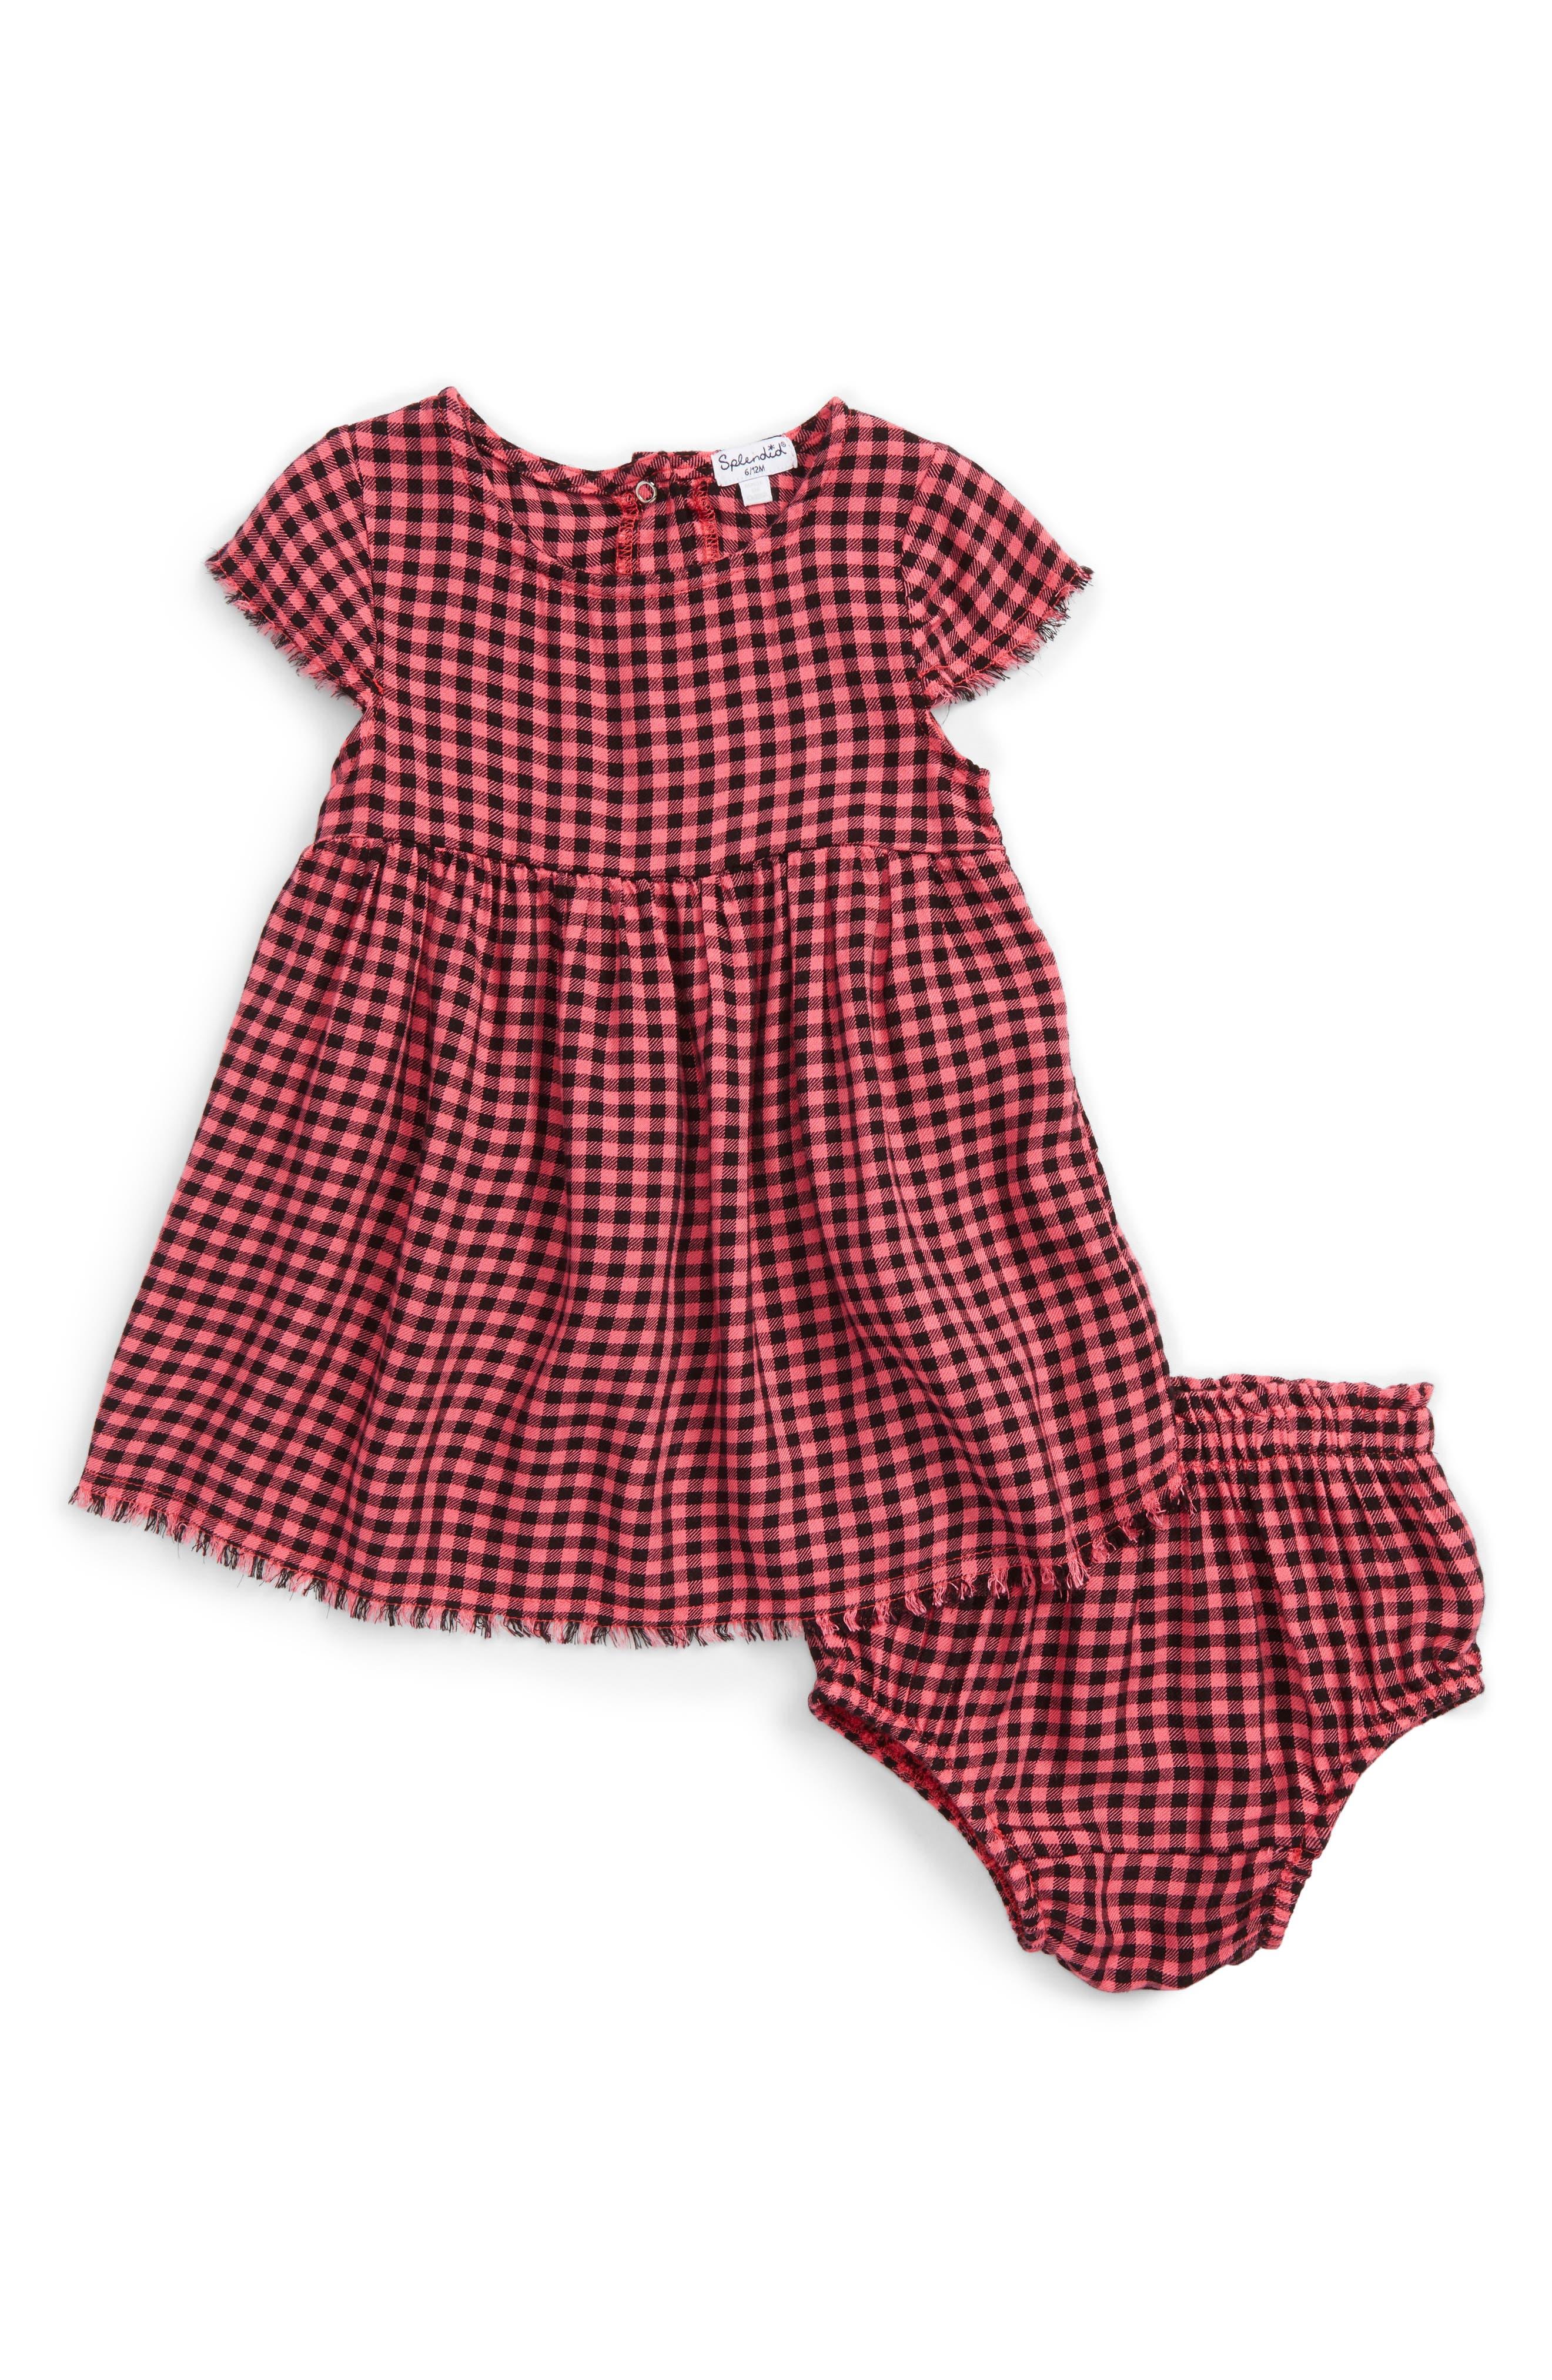 Plaid Dress,                             Main thumbnail 1, color,                             Check S970